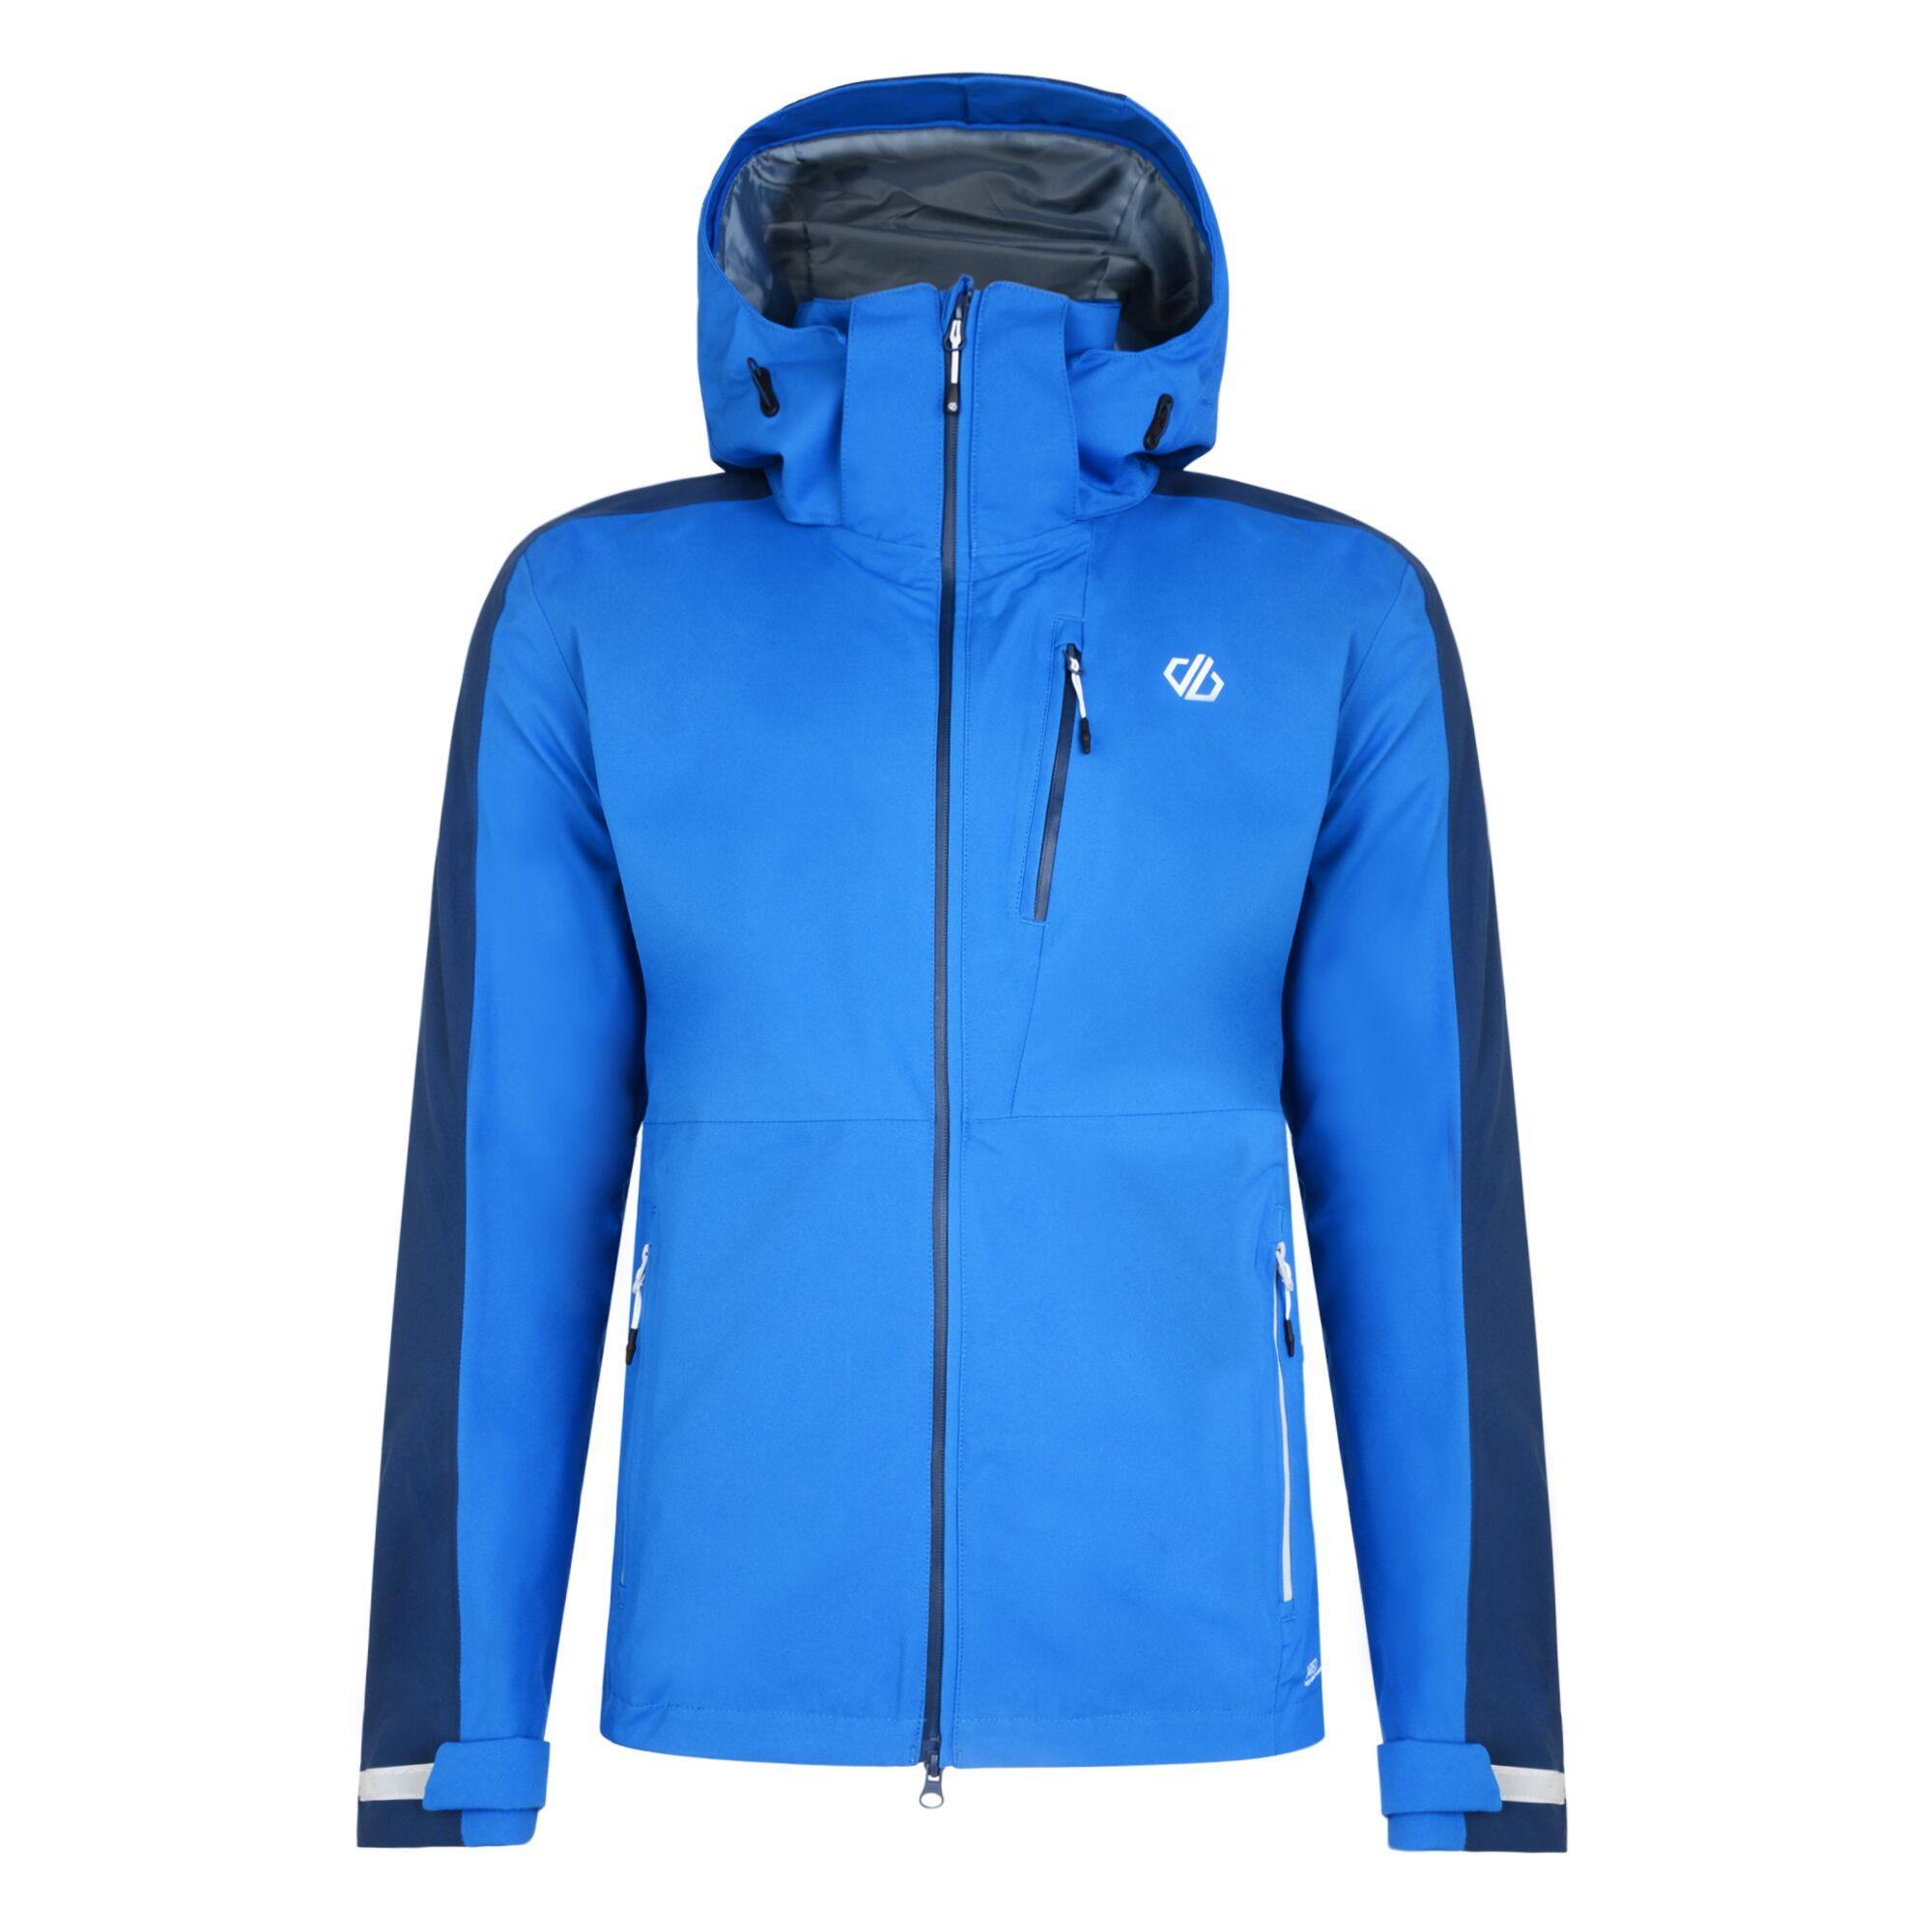 Dare2b Men's Diluent Lightweight Waterproof Jacket in blue for £27.46 delivered using code (mainland UK) @ eBay / Regatta